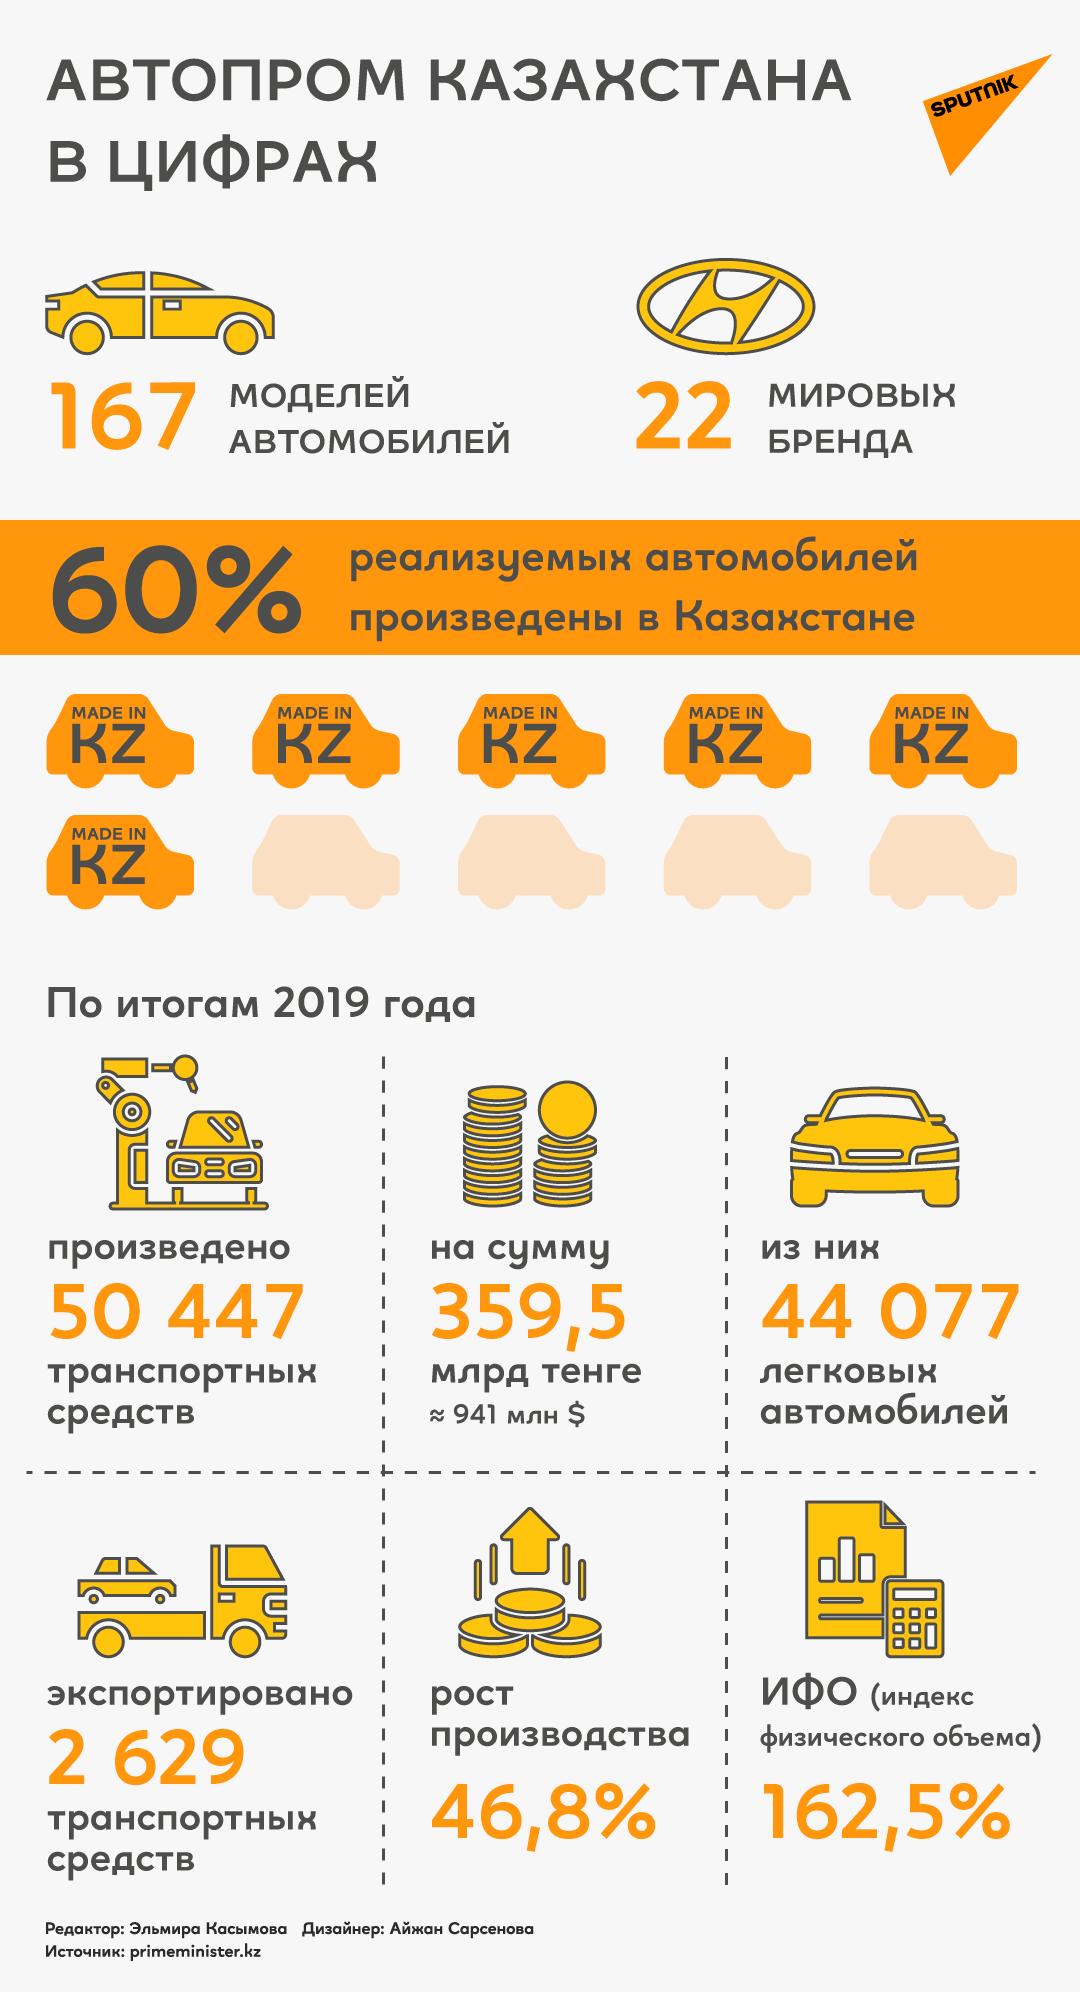 Инфографика: автопром Казахстана в цифрах